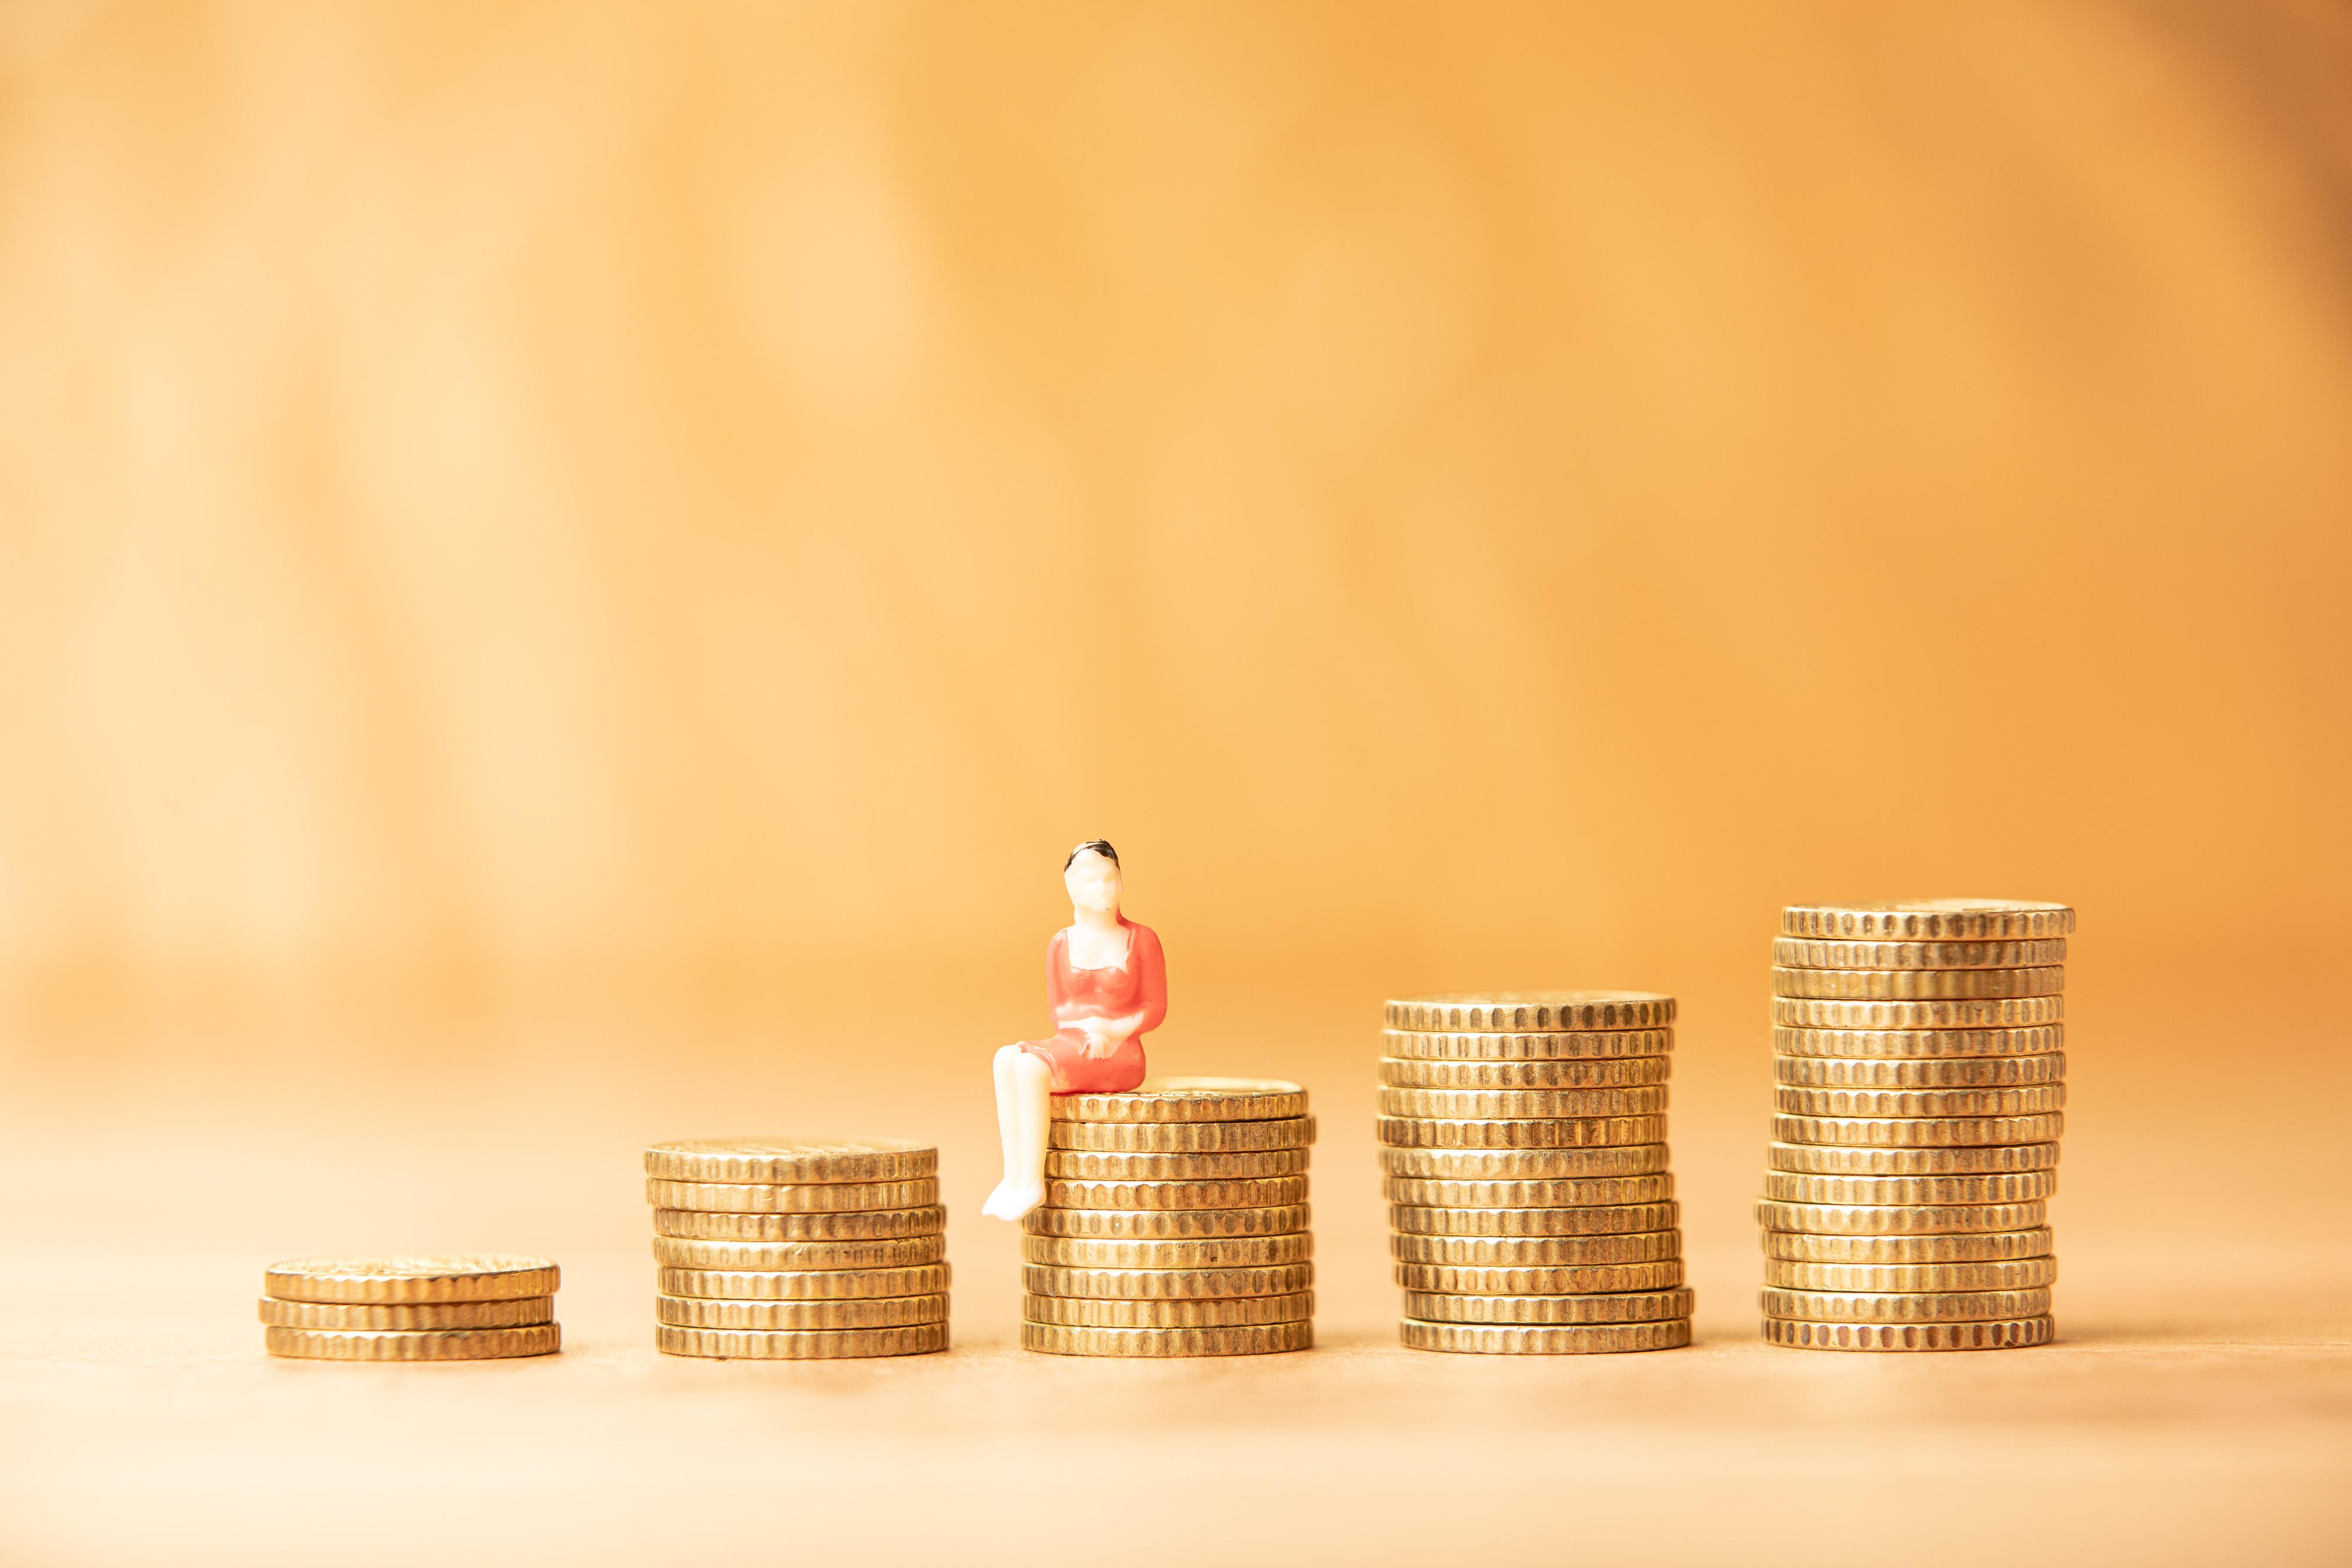 Coins and miniature figurine